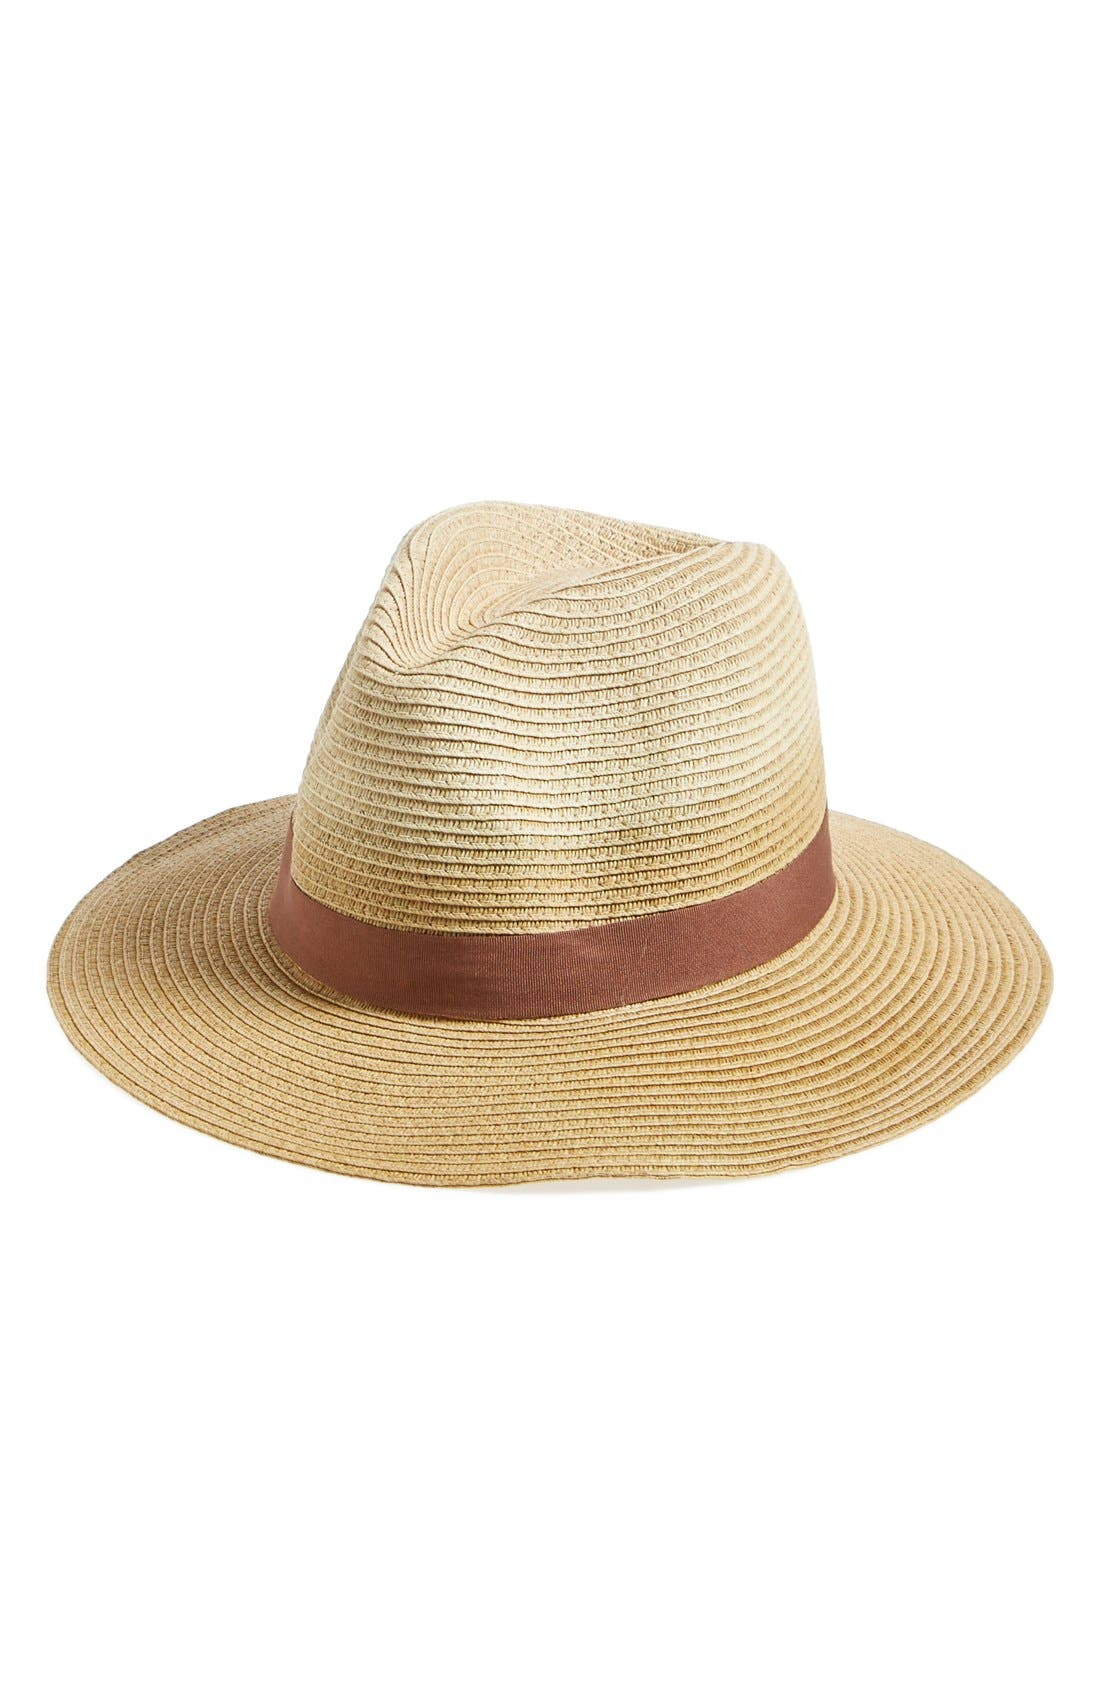 T+C BY THEODORA & CALLUM,                             Dip Dye Straw Panama Hat,                             Main thumbnail 1, color,                             250